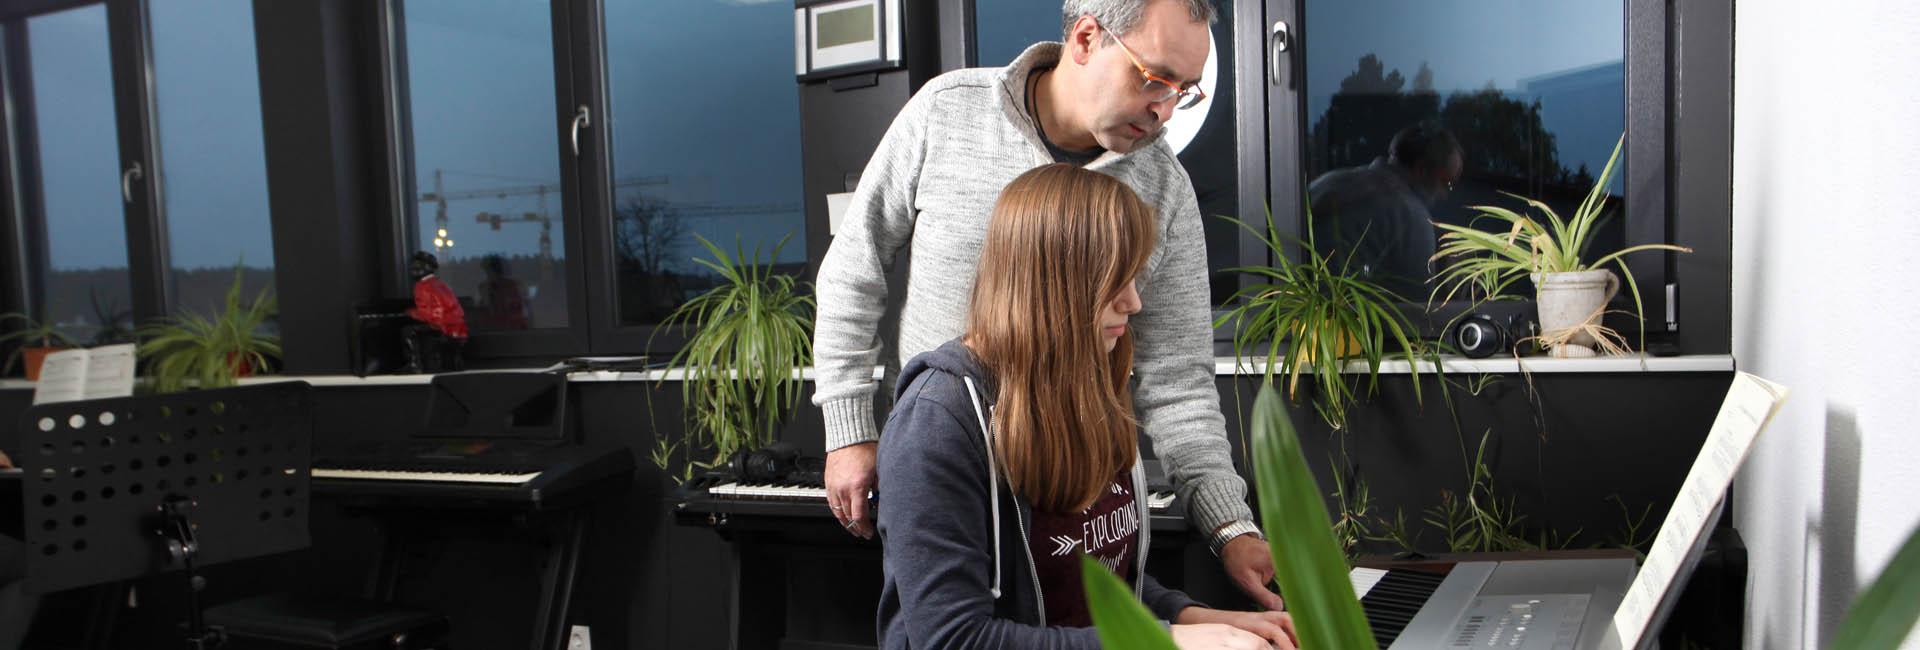 Private Musikschule Jürgen Jäger Keyboardunterricht